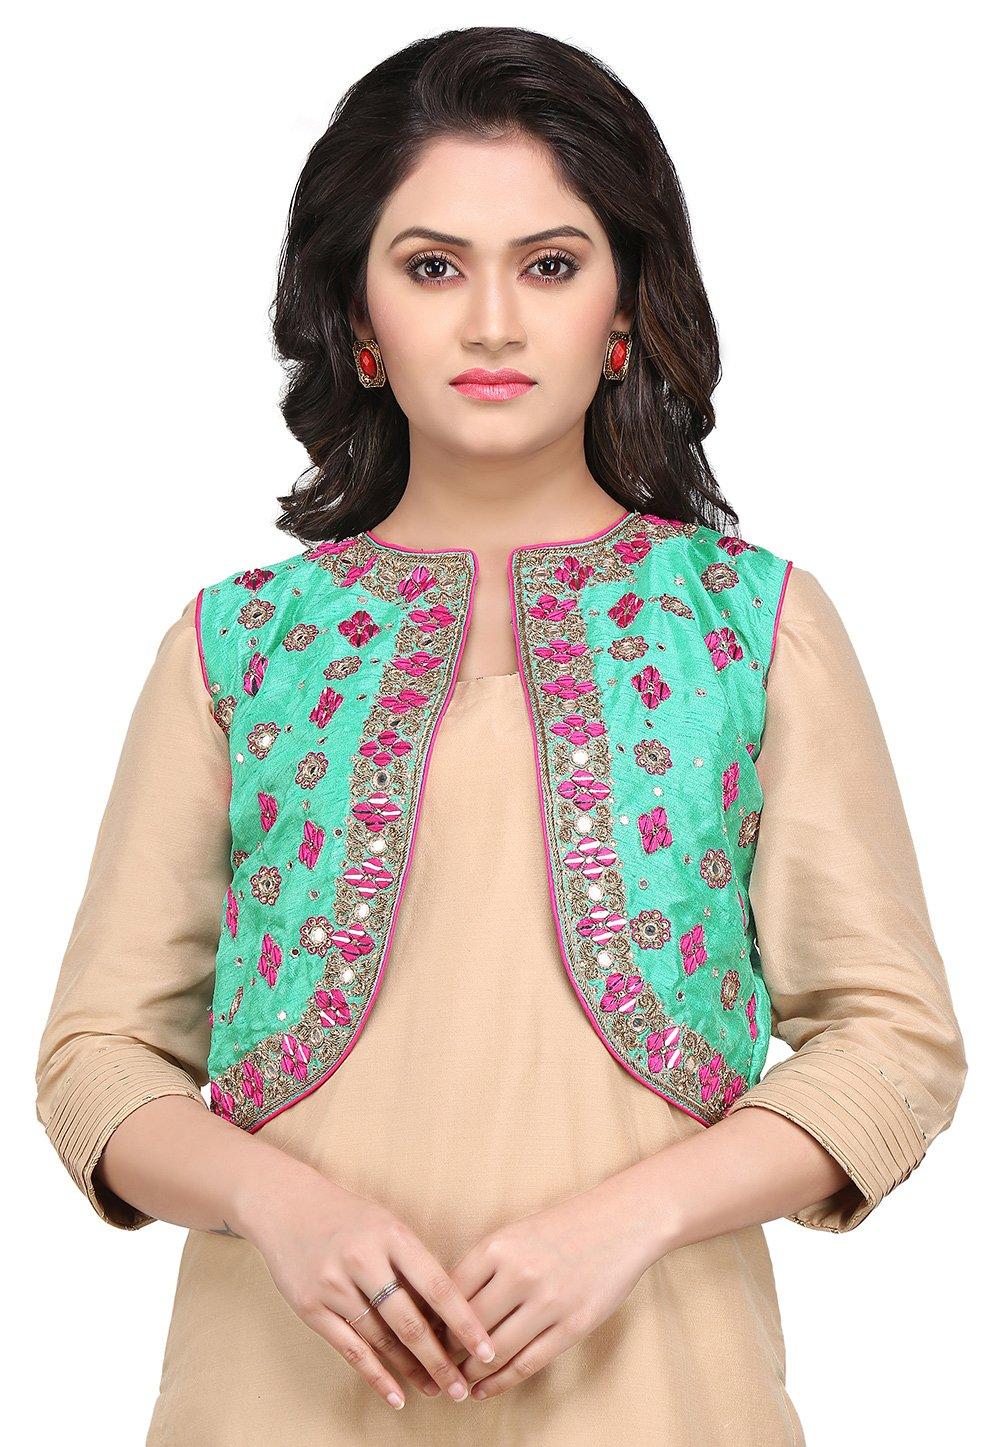 Utsav Fashion Gota Patti Embroidered Dupion Silk Jacket in Sea Green by Utsav Fashion